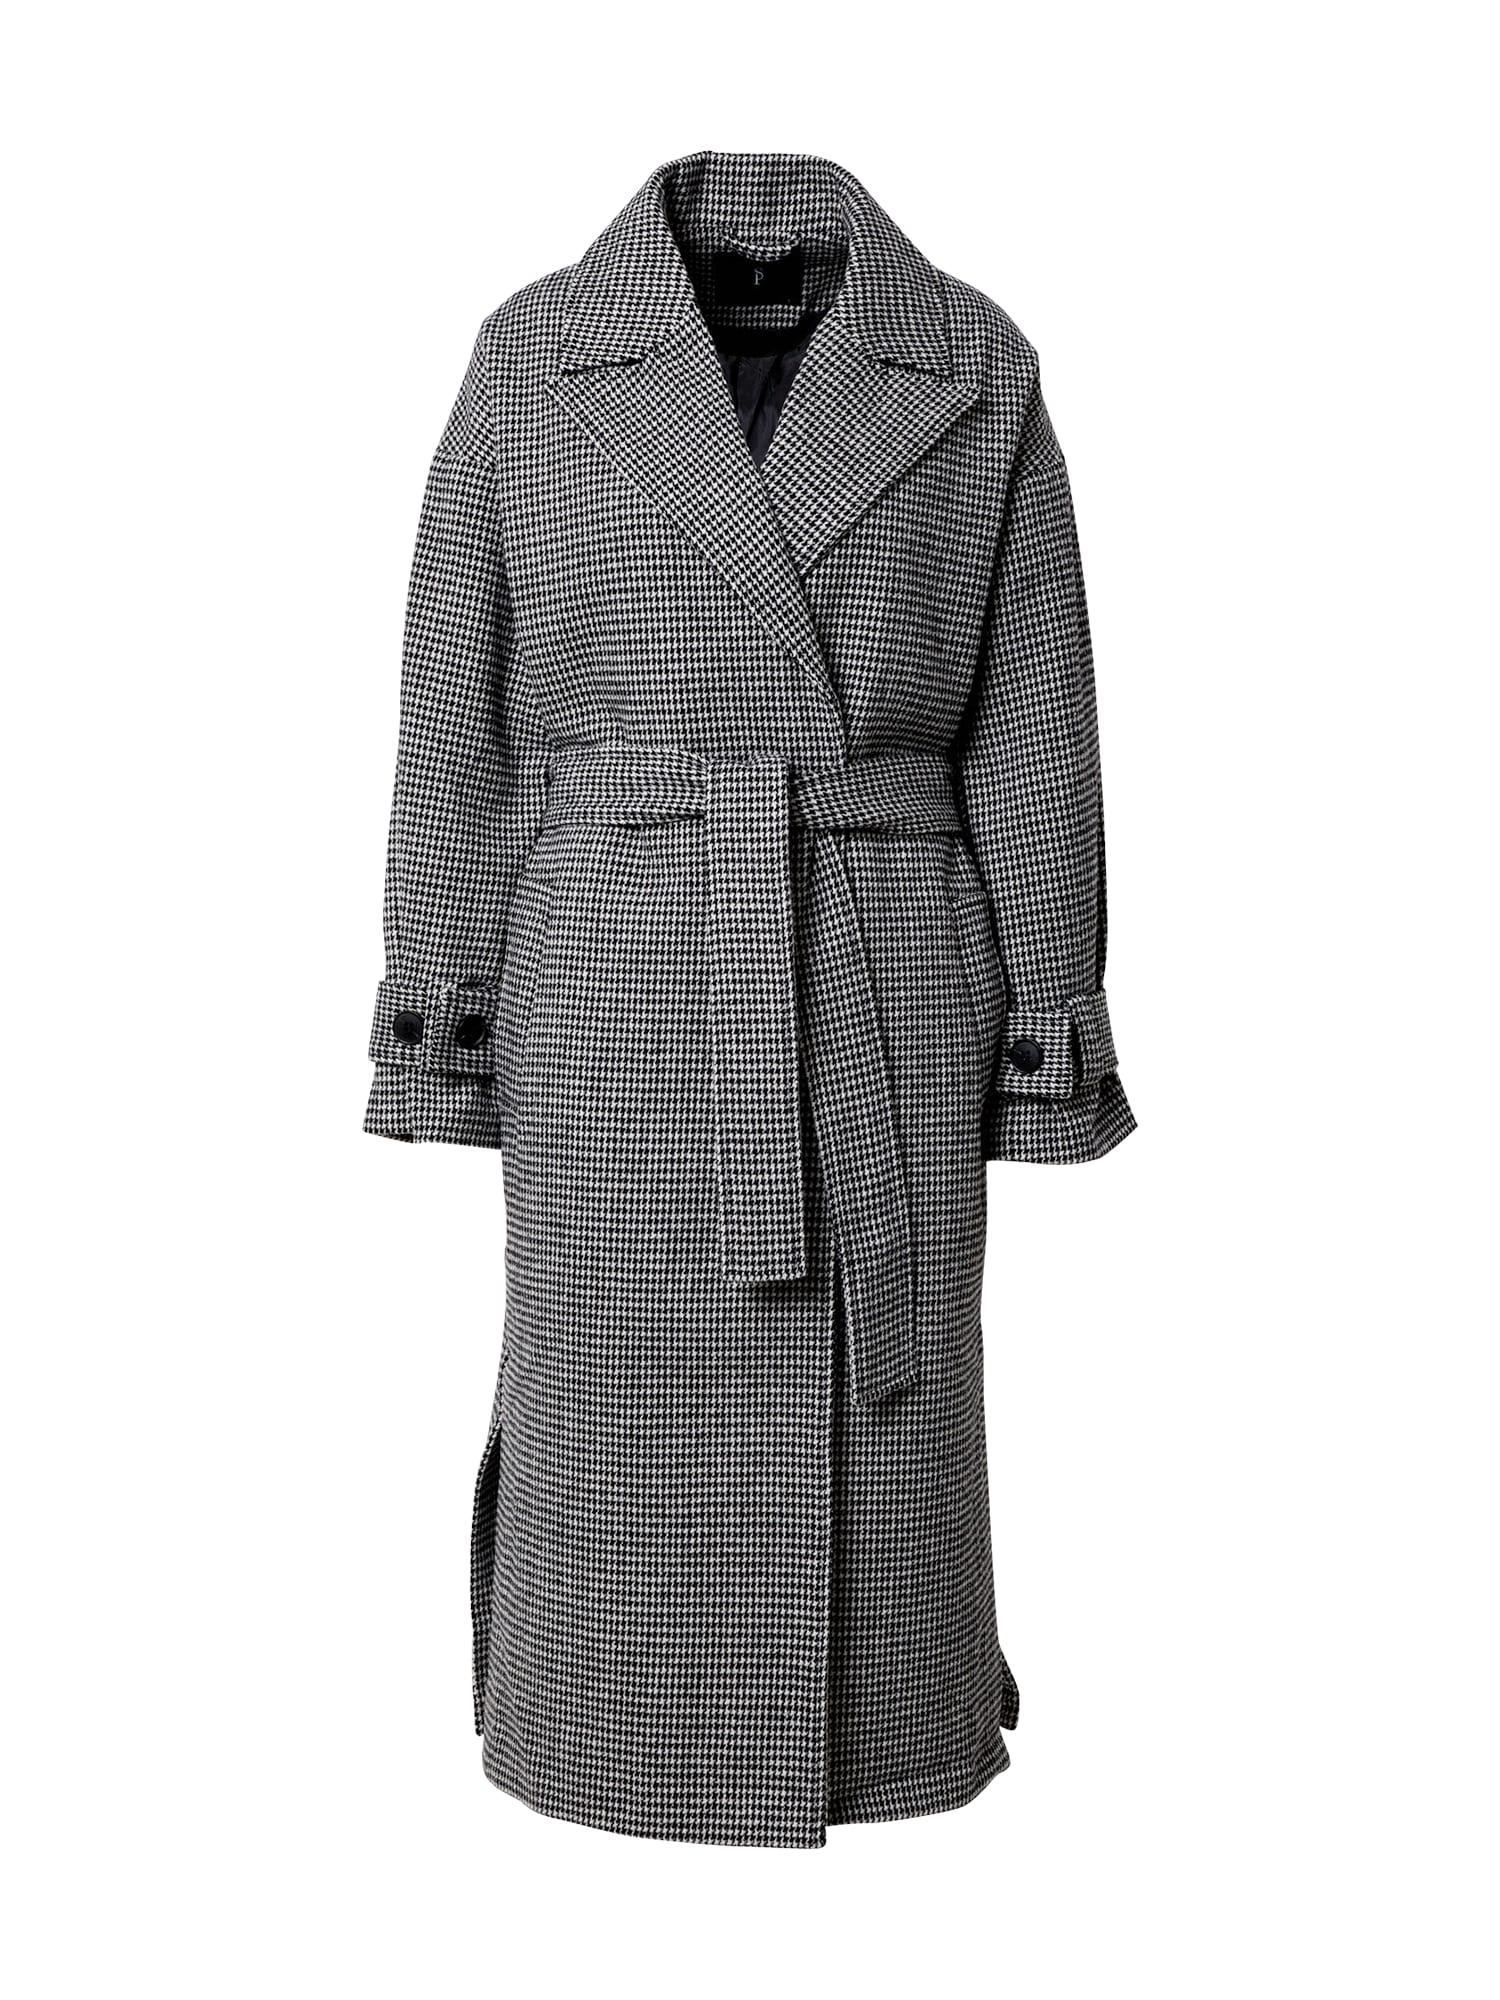 SISTERS POINT Demisezoninis paltas juoda / balta